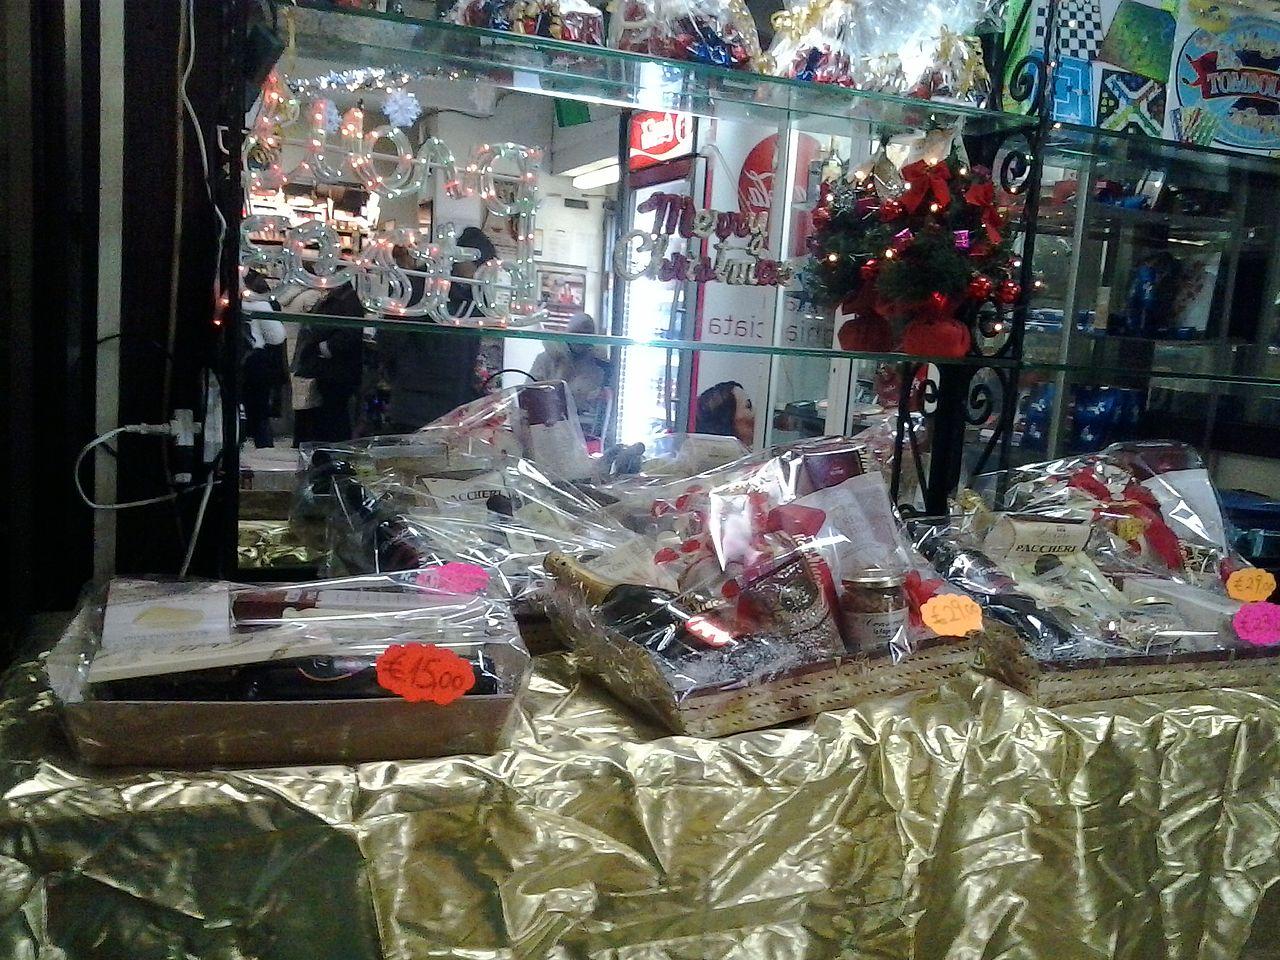 vendita cesti natalizi online dating